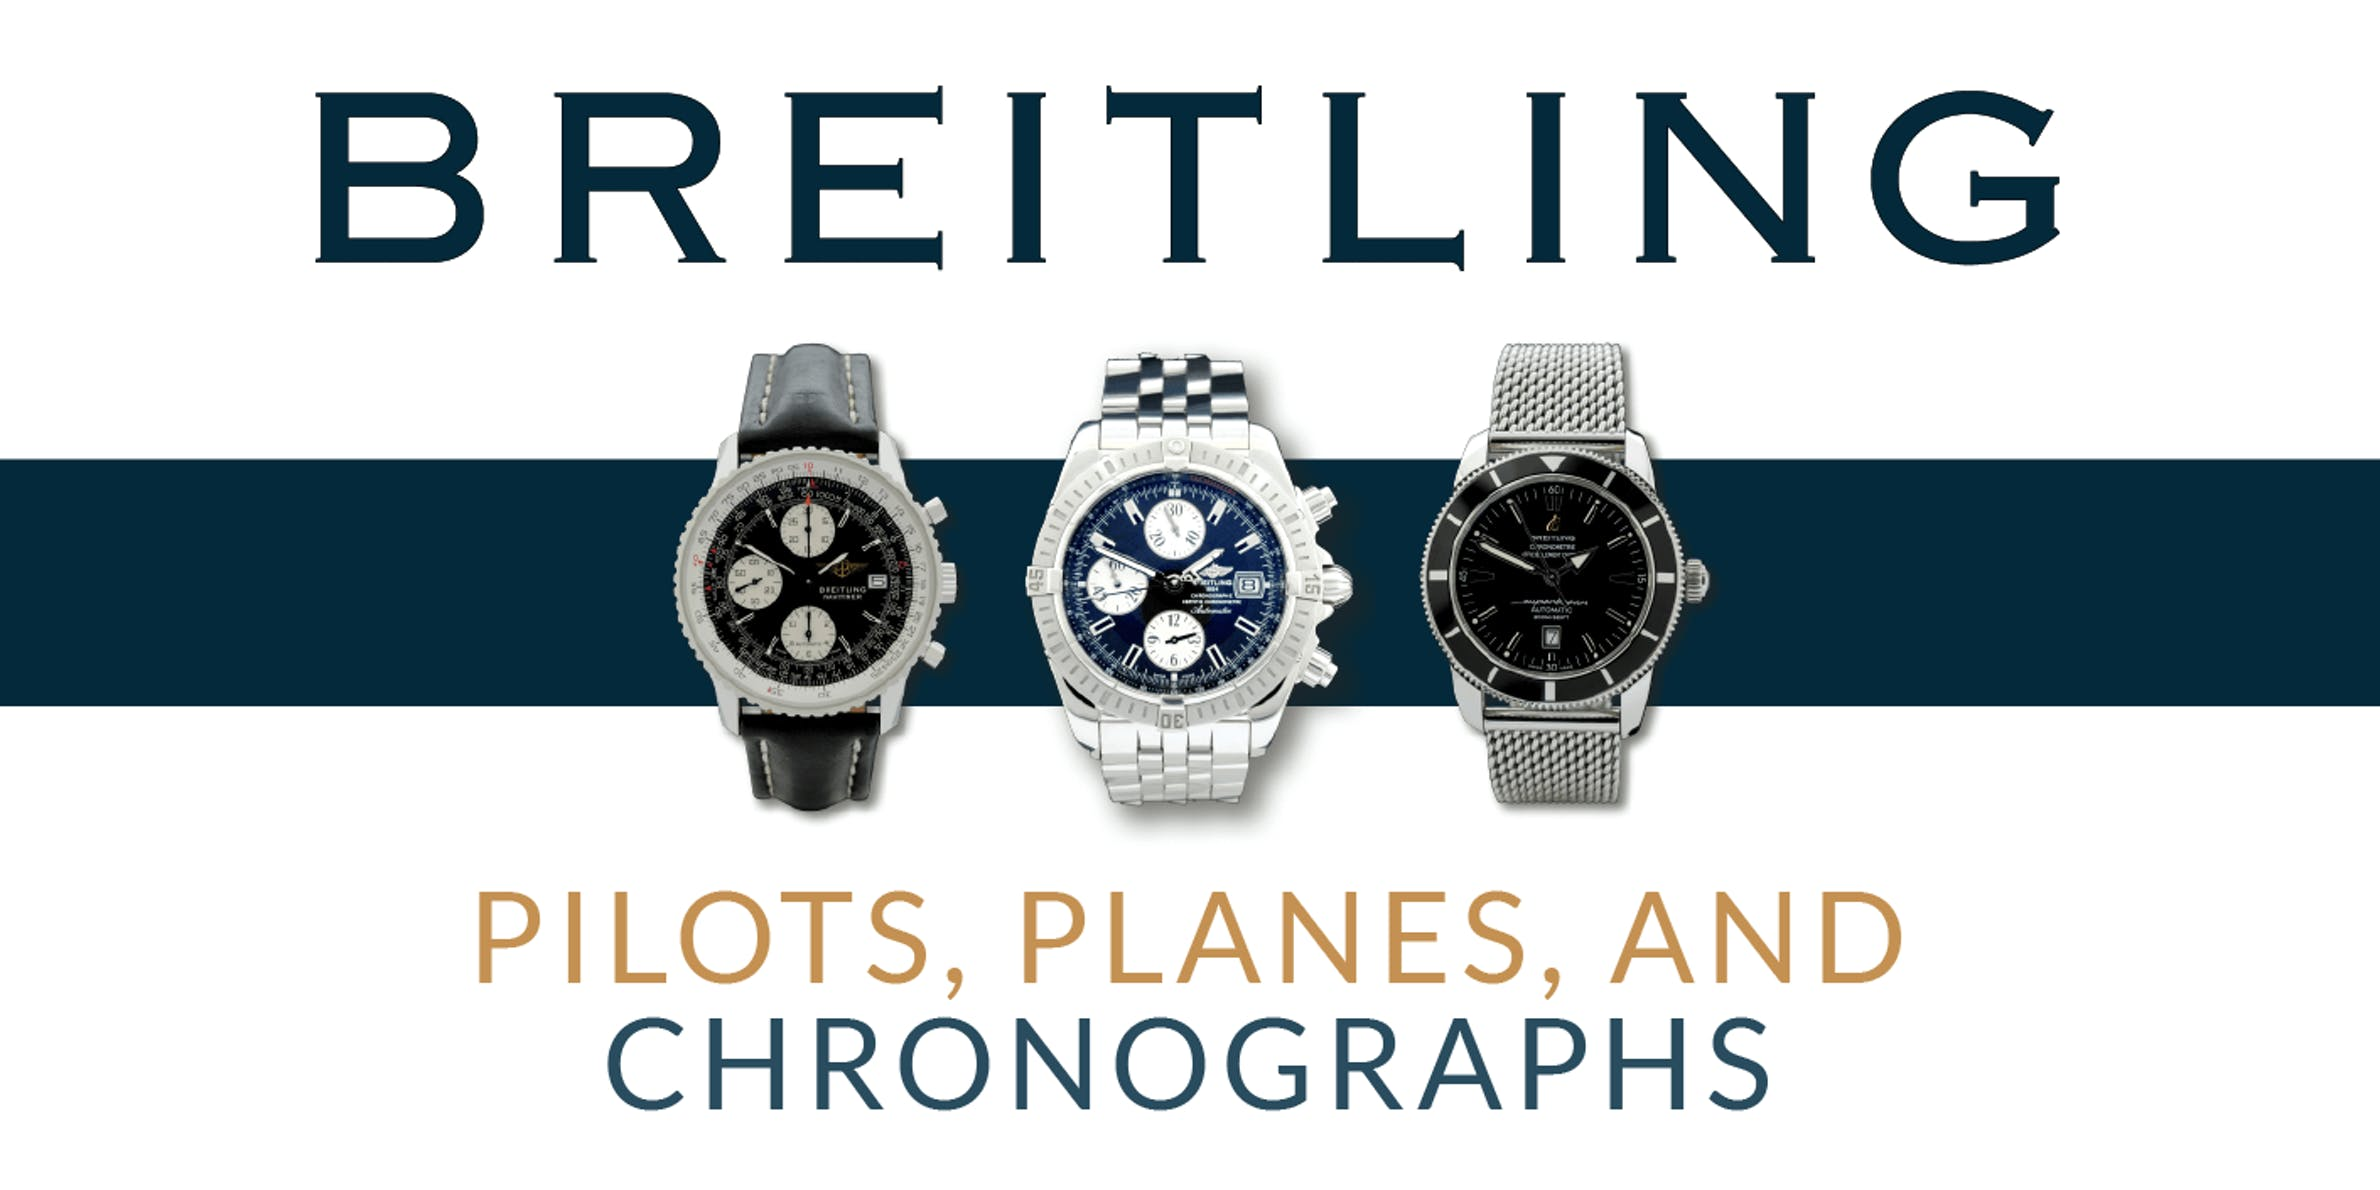 Breitling infographic teaser